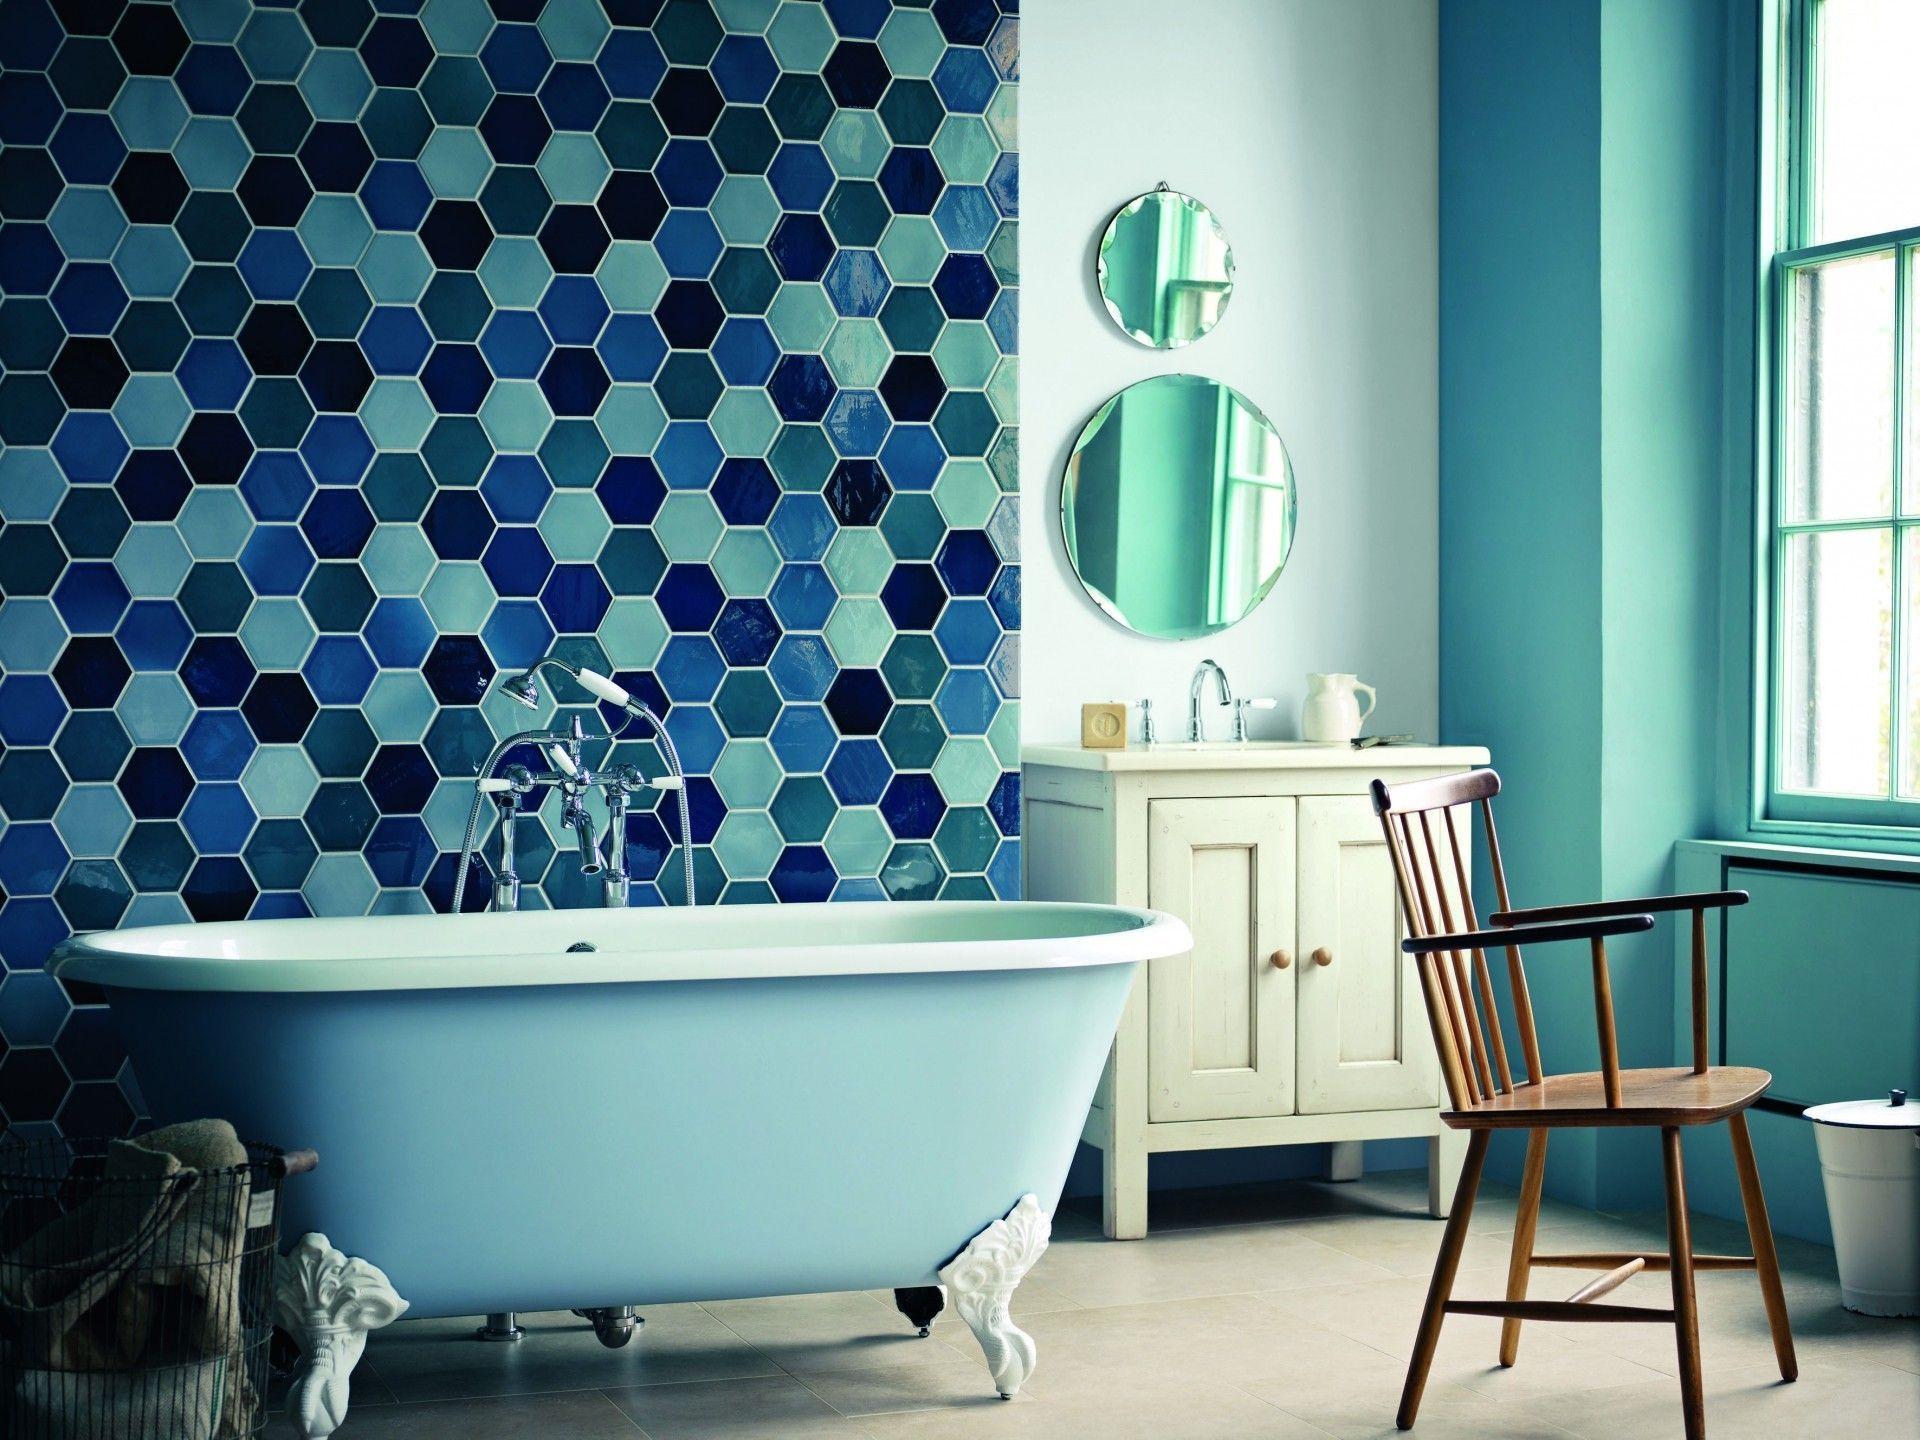 Classic Bathroom With Hexagonal Blue Mosaic Wall Tiles Creative ...